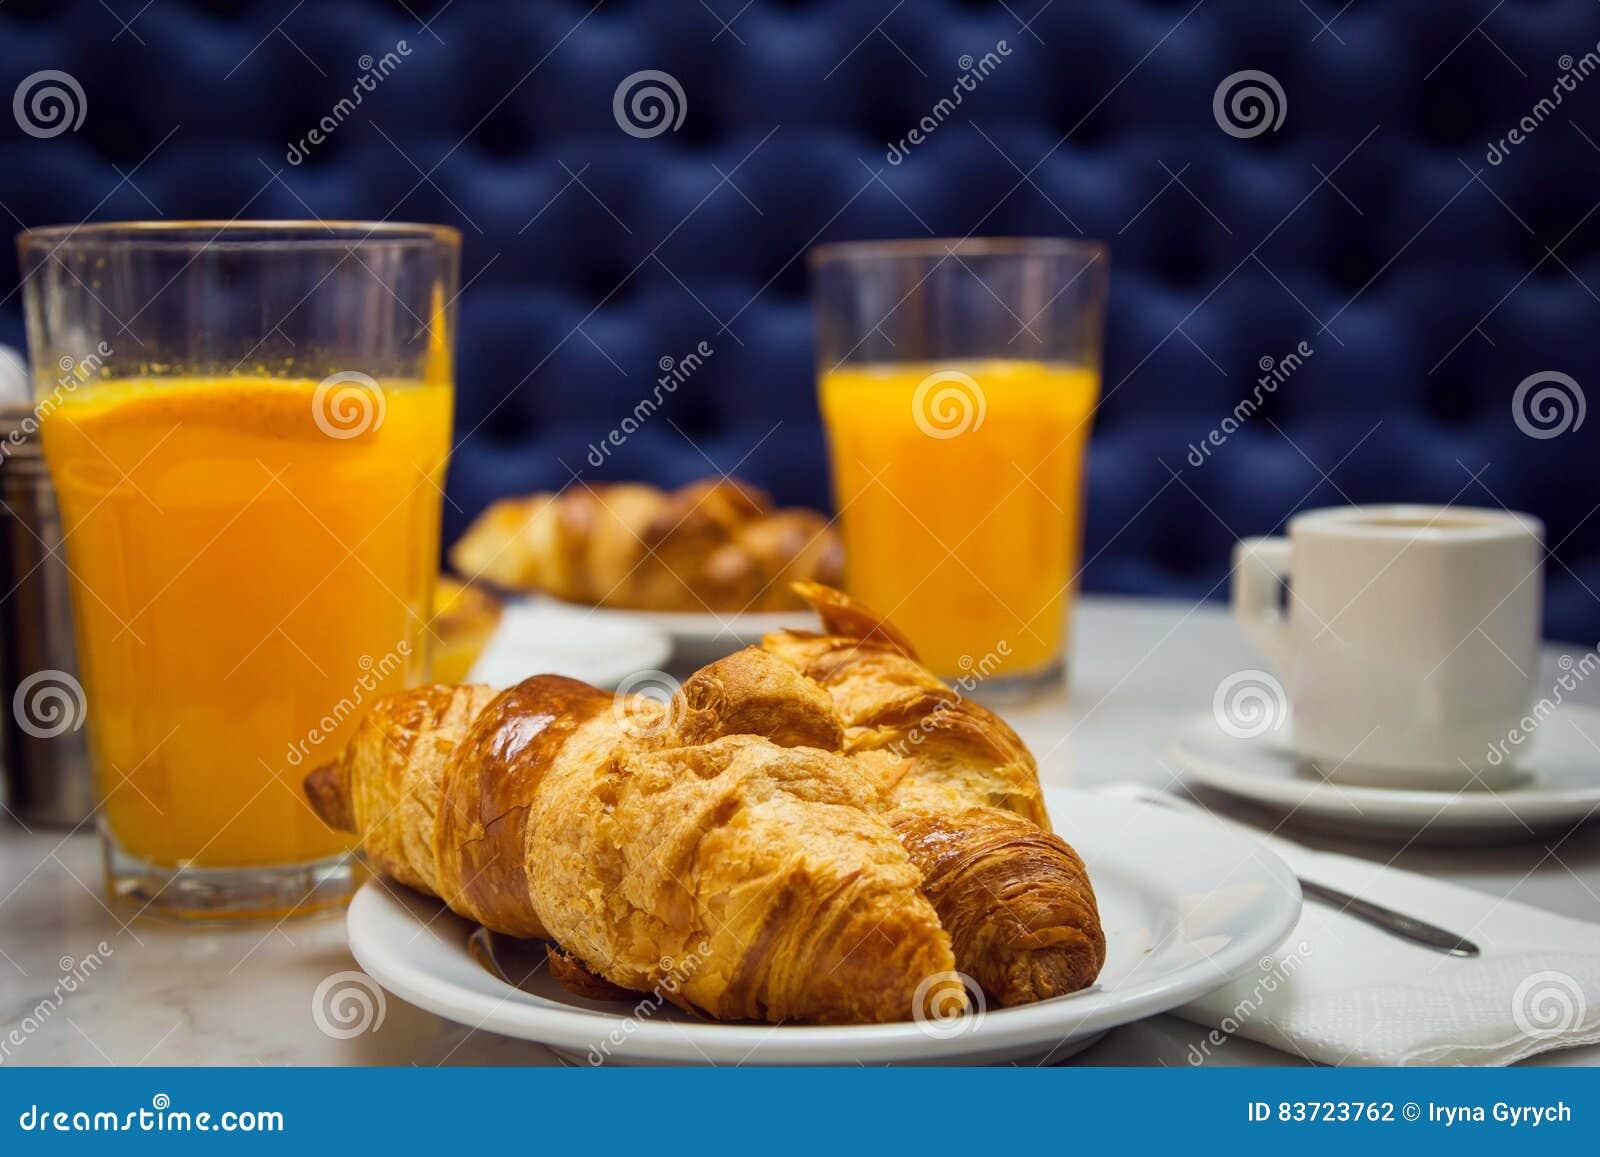 Breakfast With Croissant And Orange Juice Stock Photo